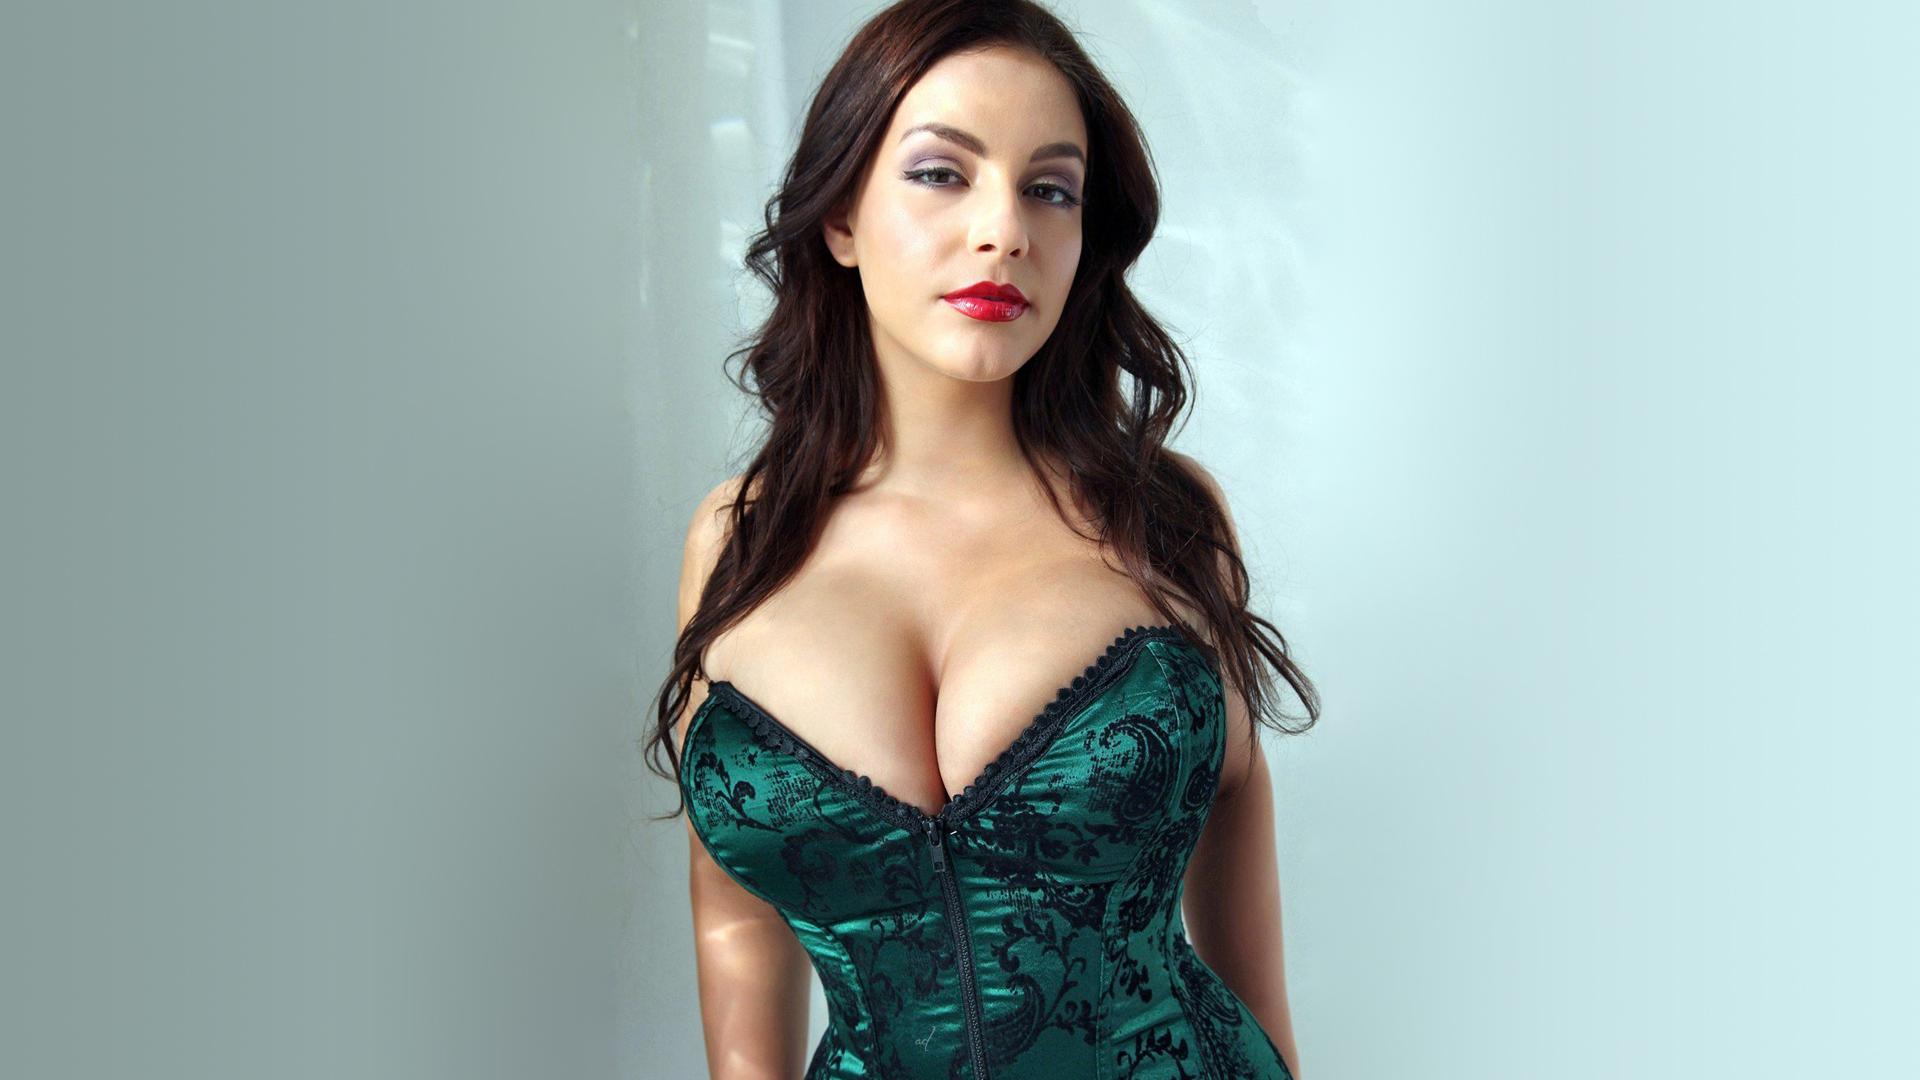 People 1920x1080 Desiree Elyda brunette model cleavage corset big boobs green background